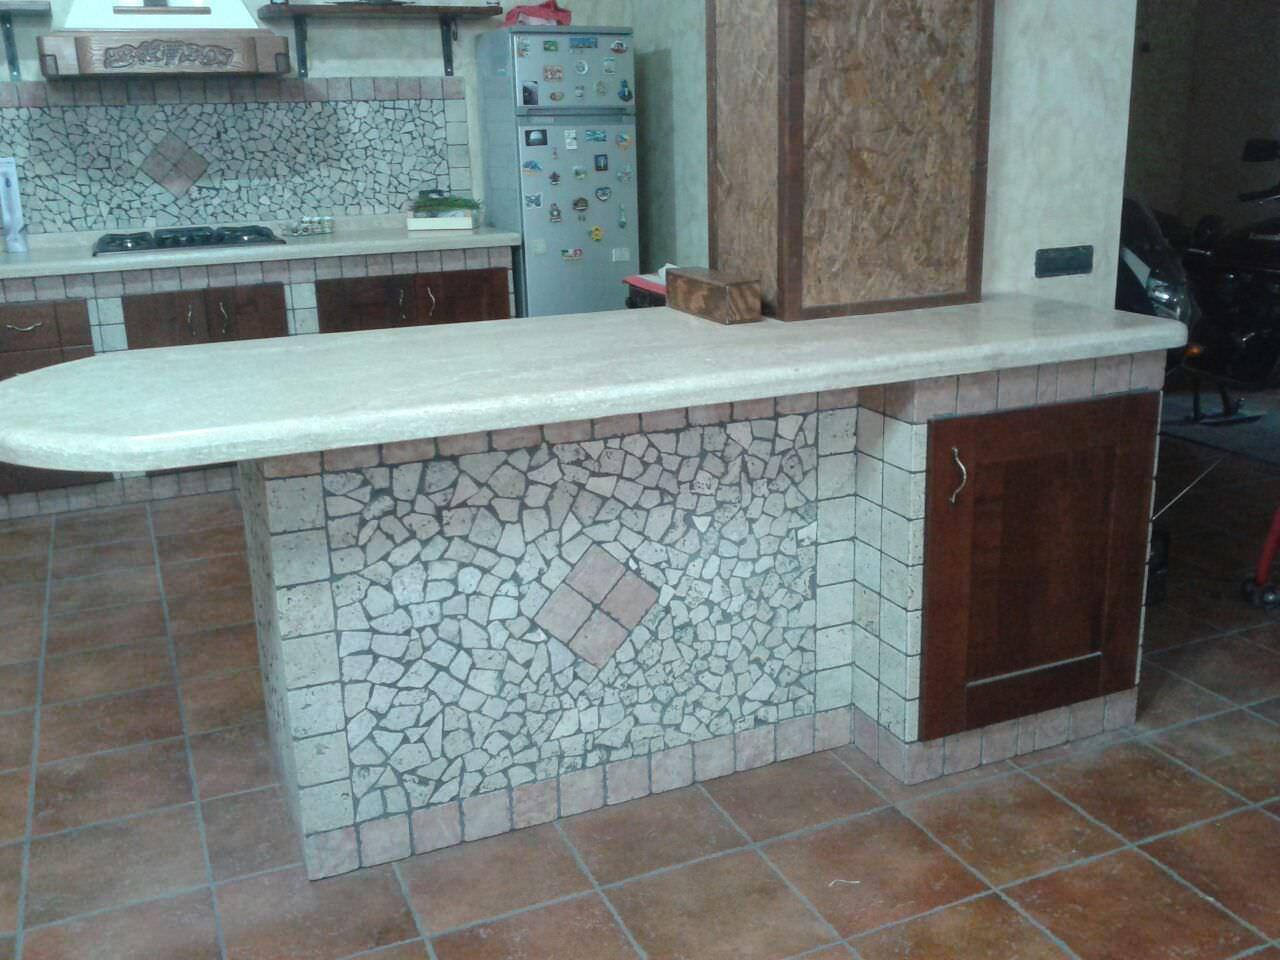 Cucina in muratura costi awesome piastrelle per cucina in muratura with cucina in muratura - Cucine in muratura costi ...